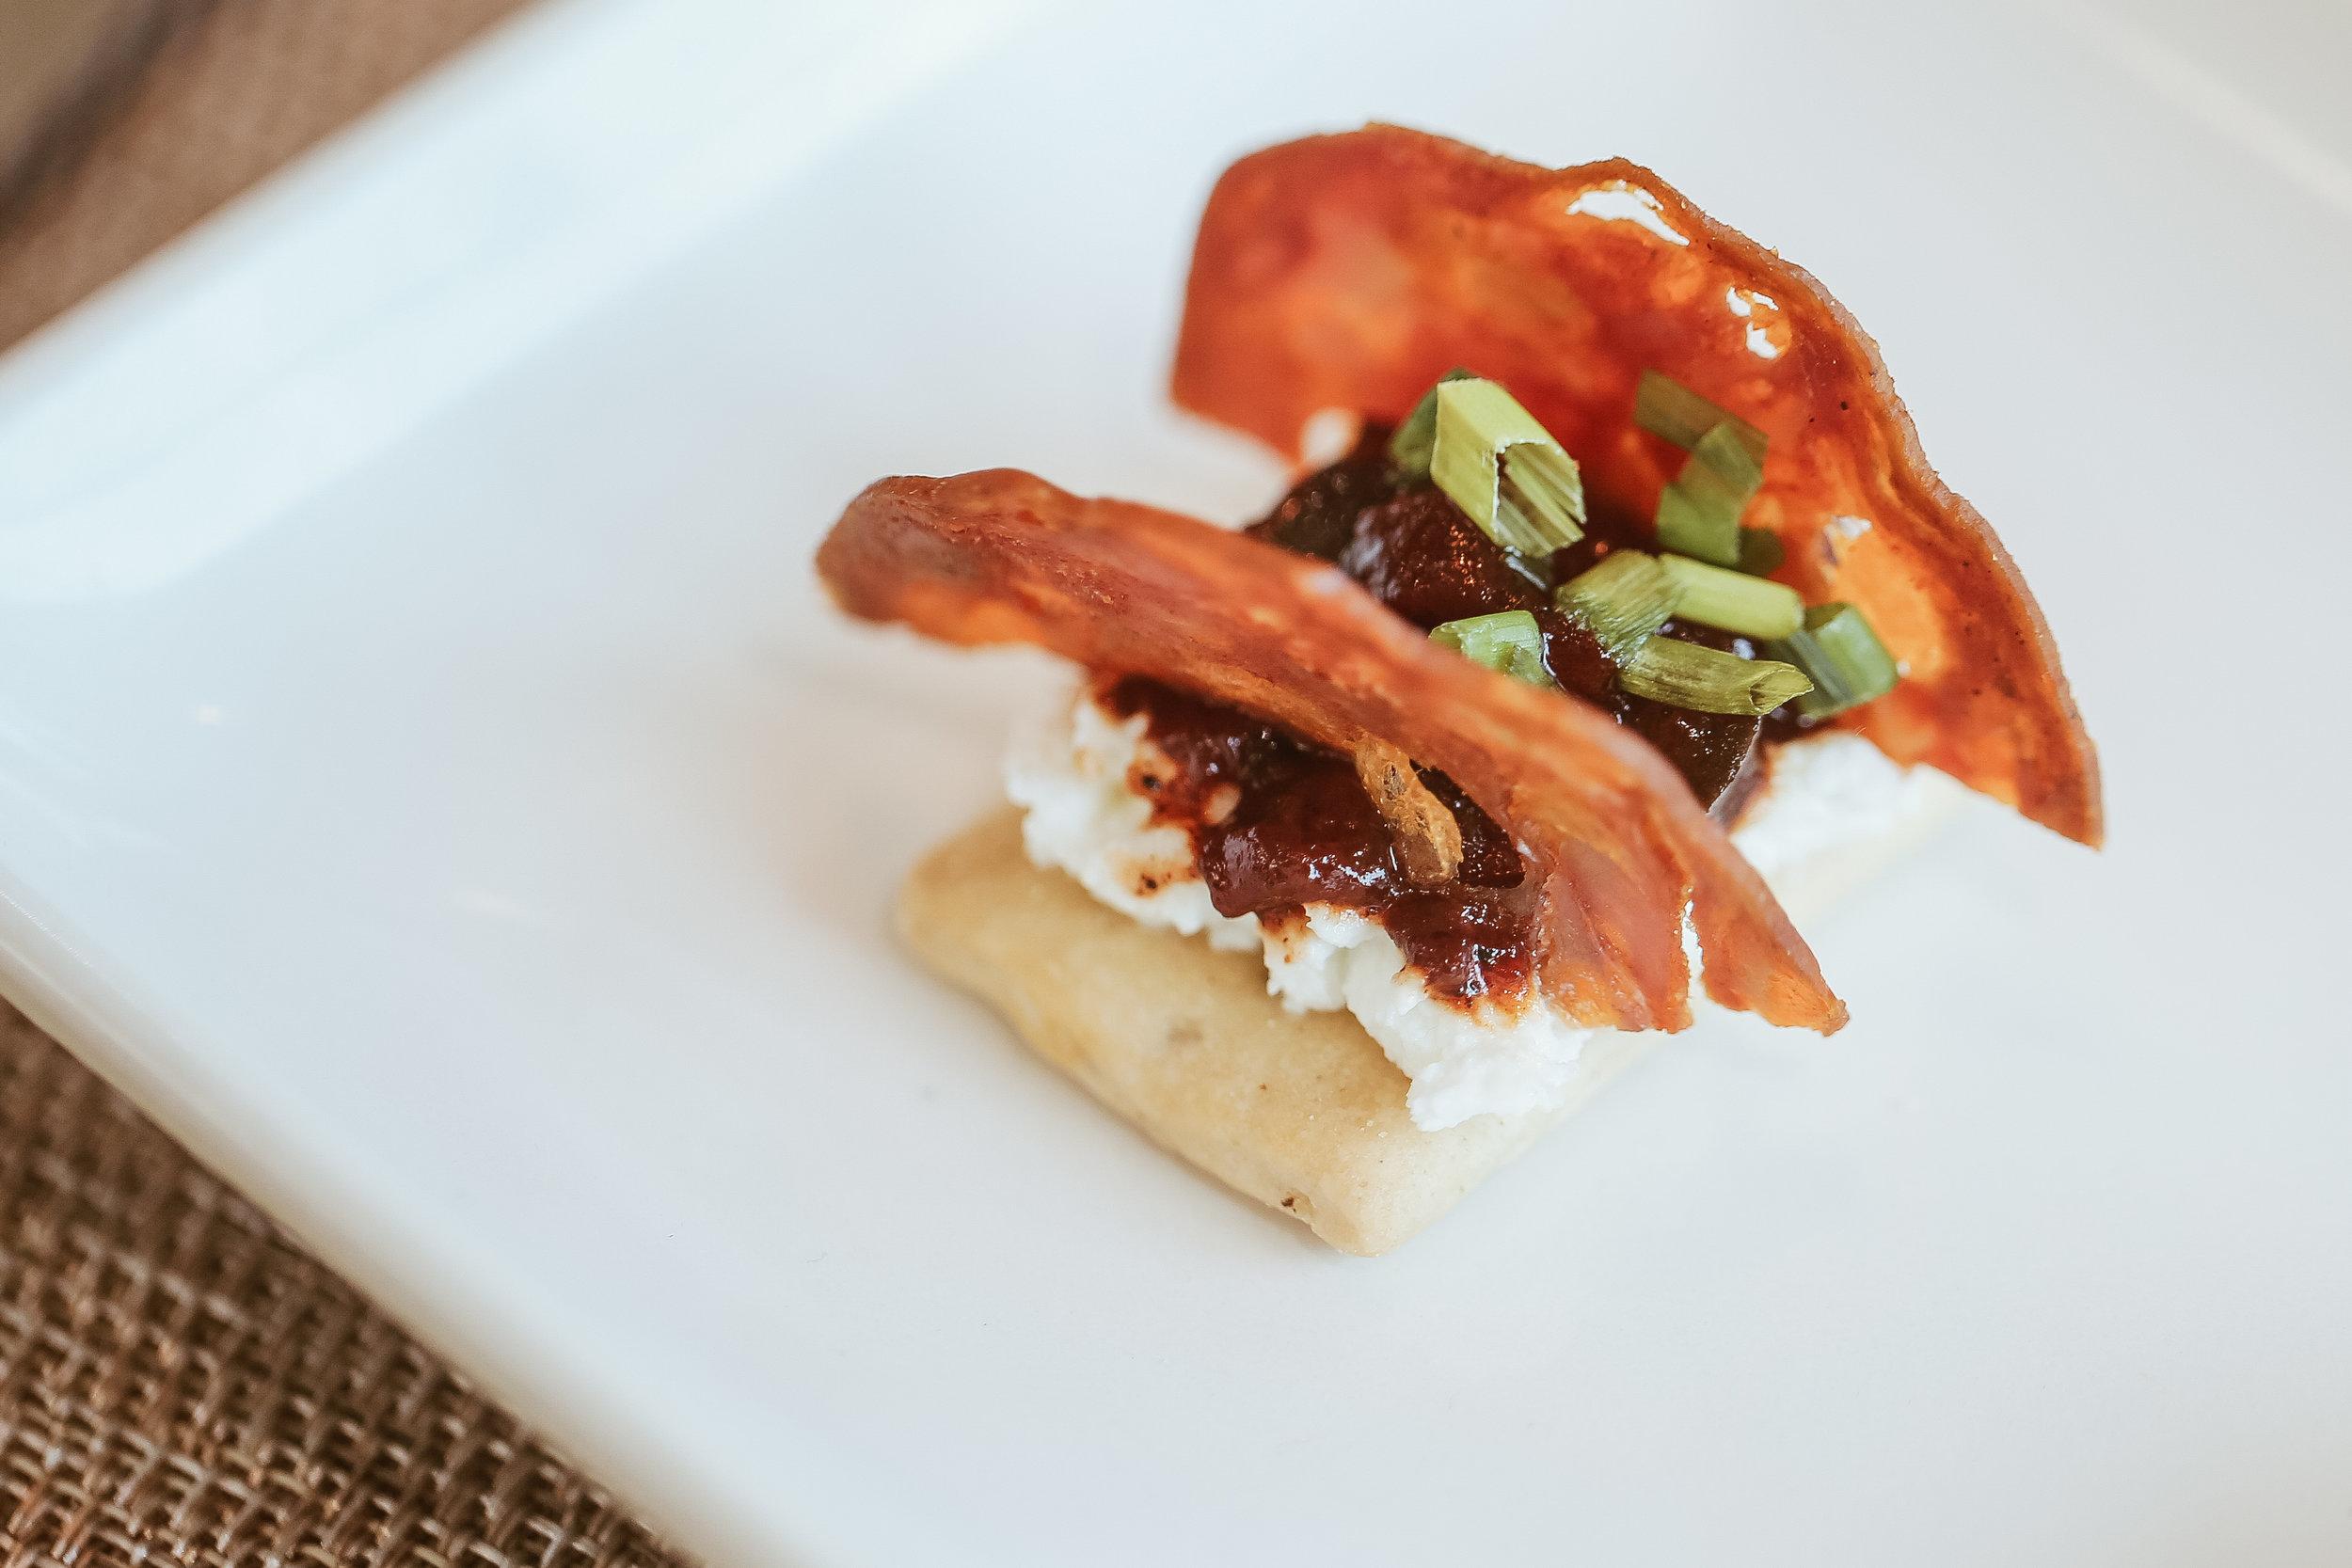 Extra Brut Food Pairing: Salt & Pepper Crostini with Crispy Chorizo, Fresh Chevre and Ancho Chili Jam